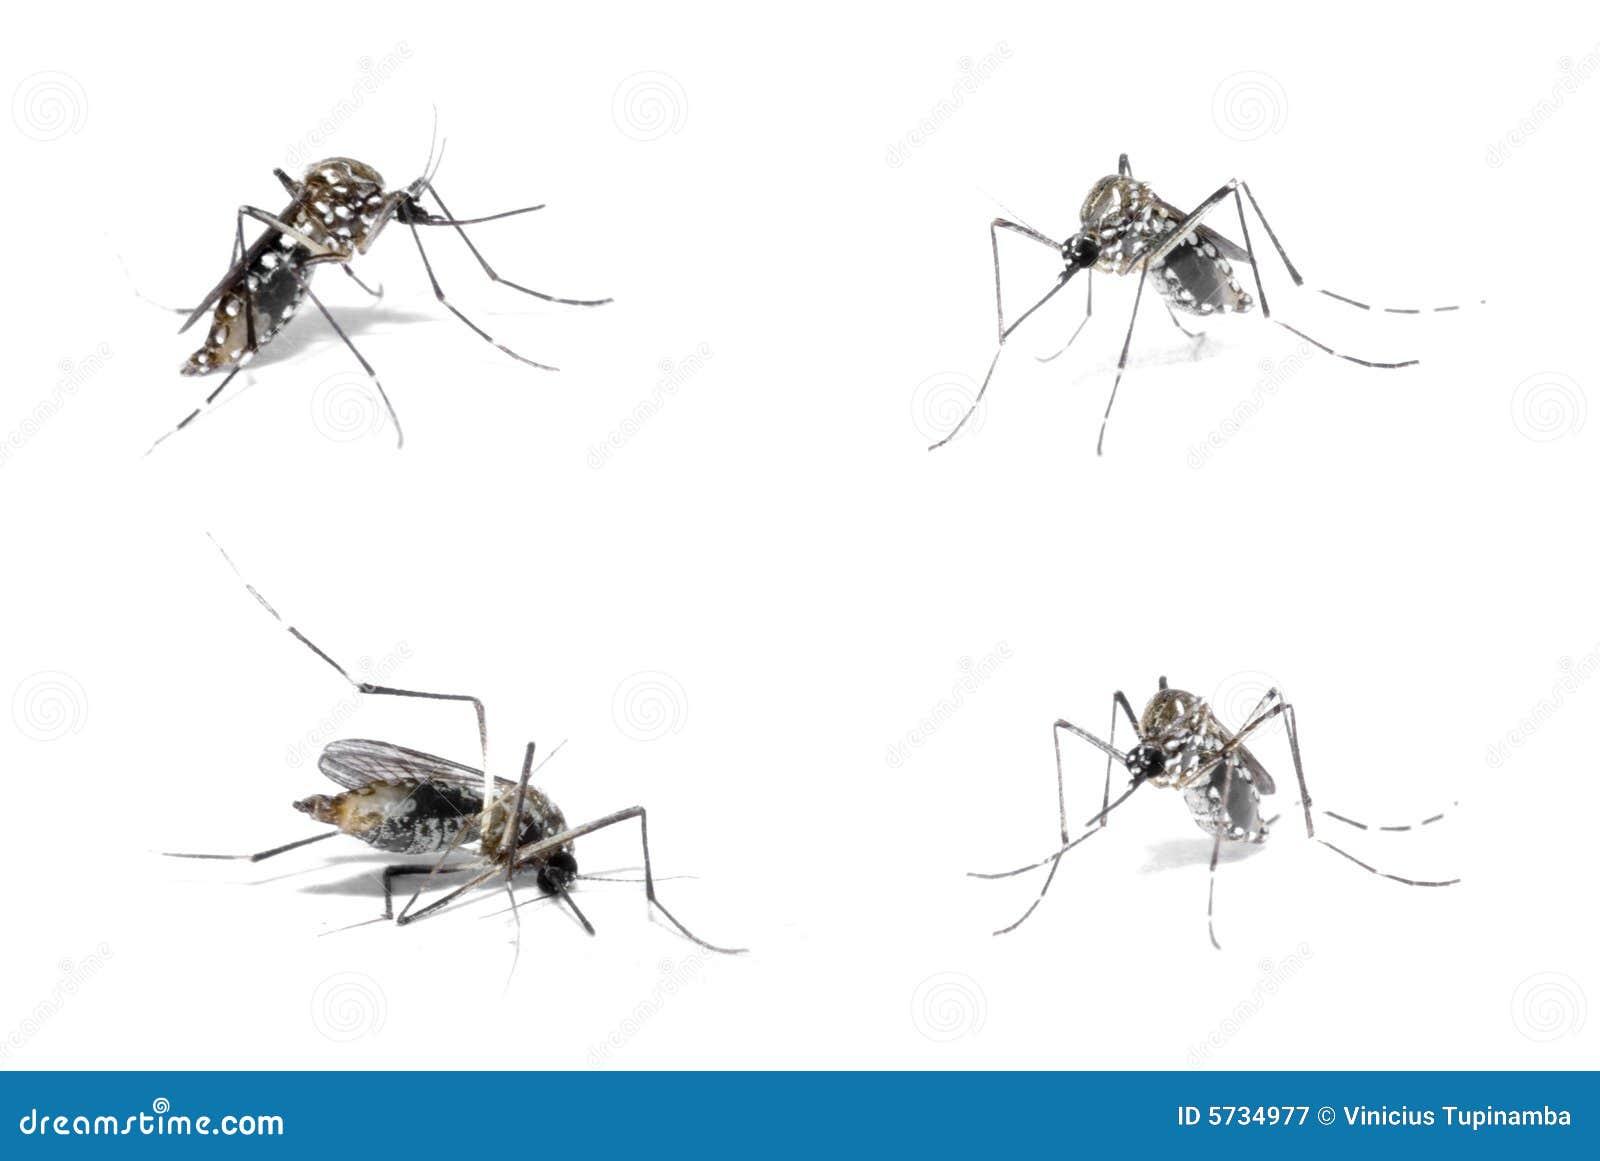 Gospodarz denga